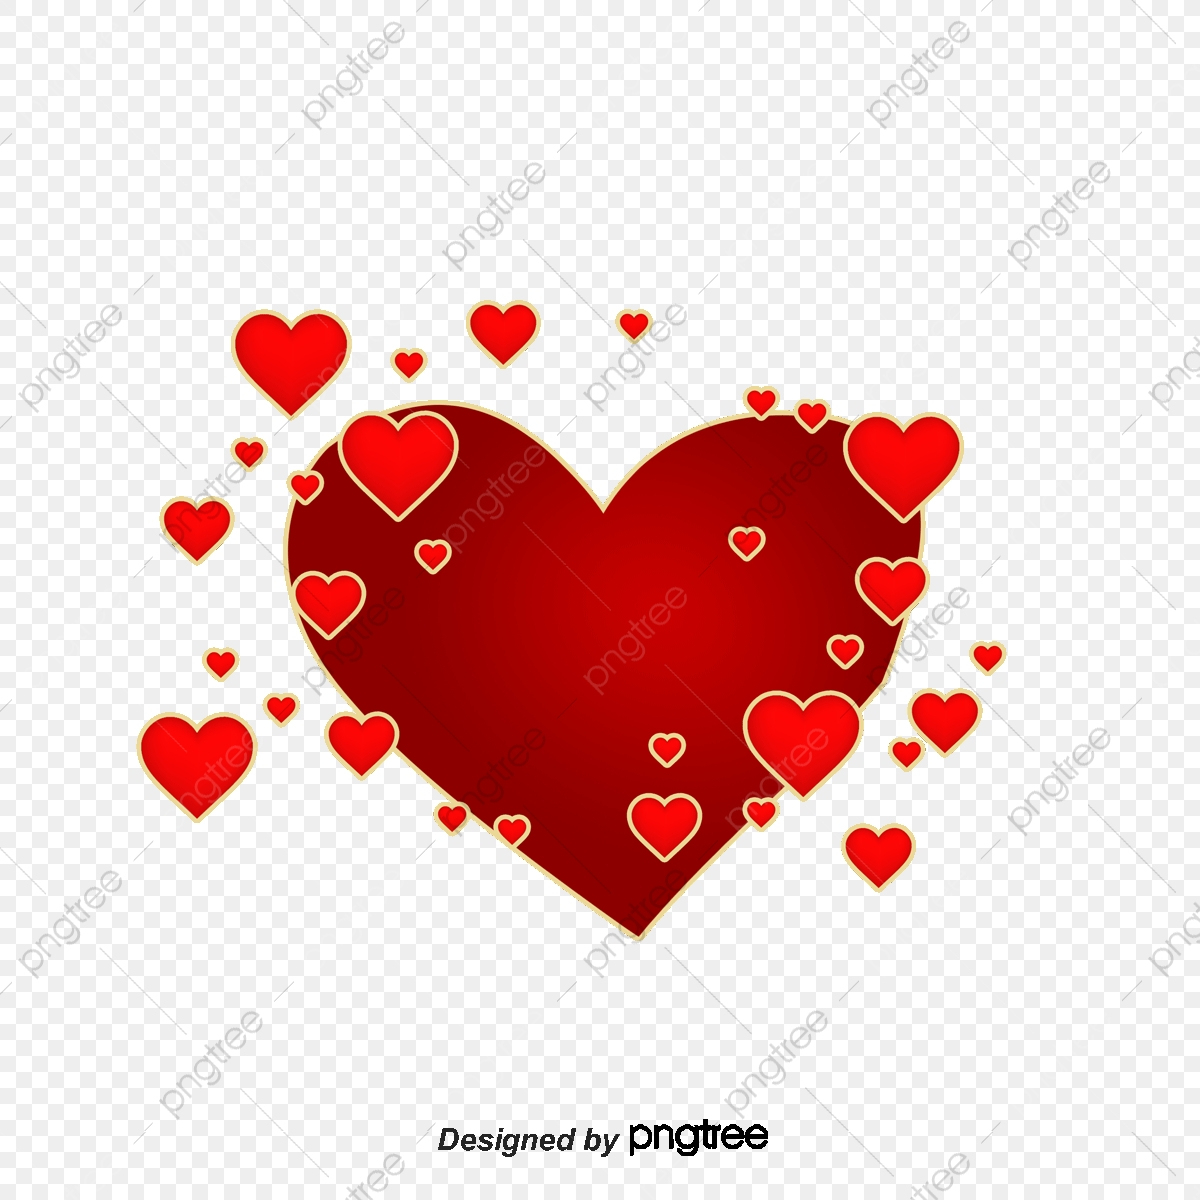 Herz, Herz, Rote Herzen, Dekorative Muster Png Und Vektor verwandt mit Herzen Bilder Kostenlos